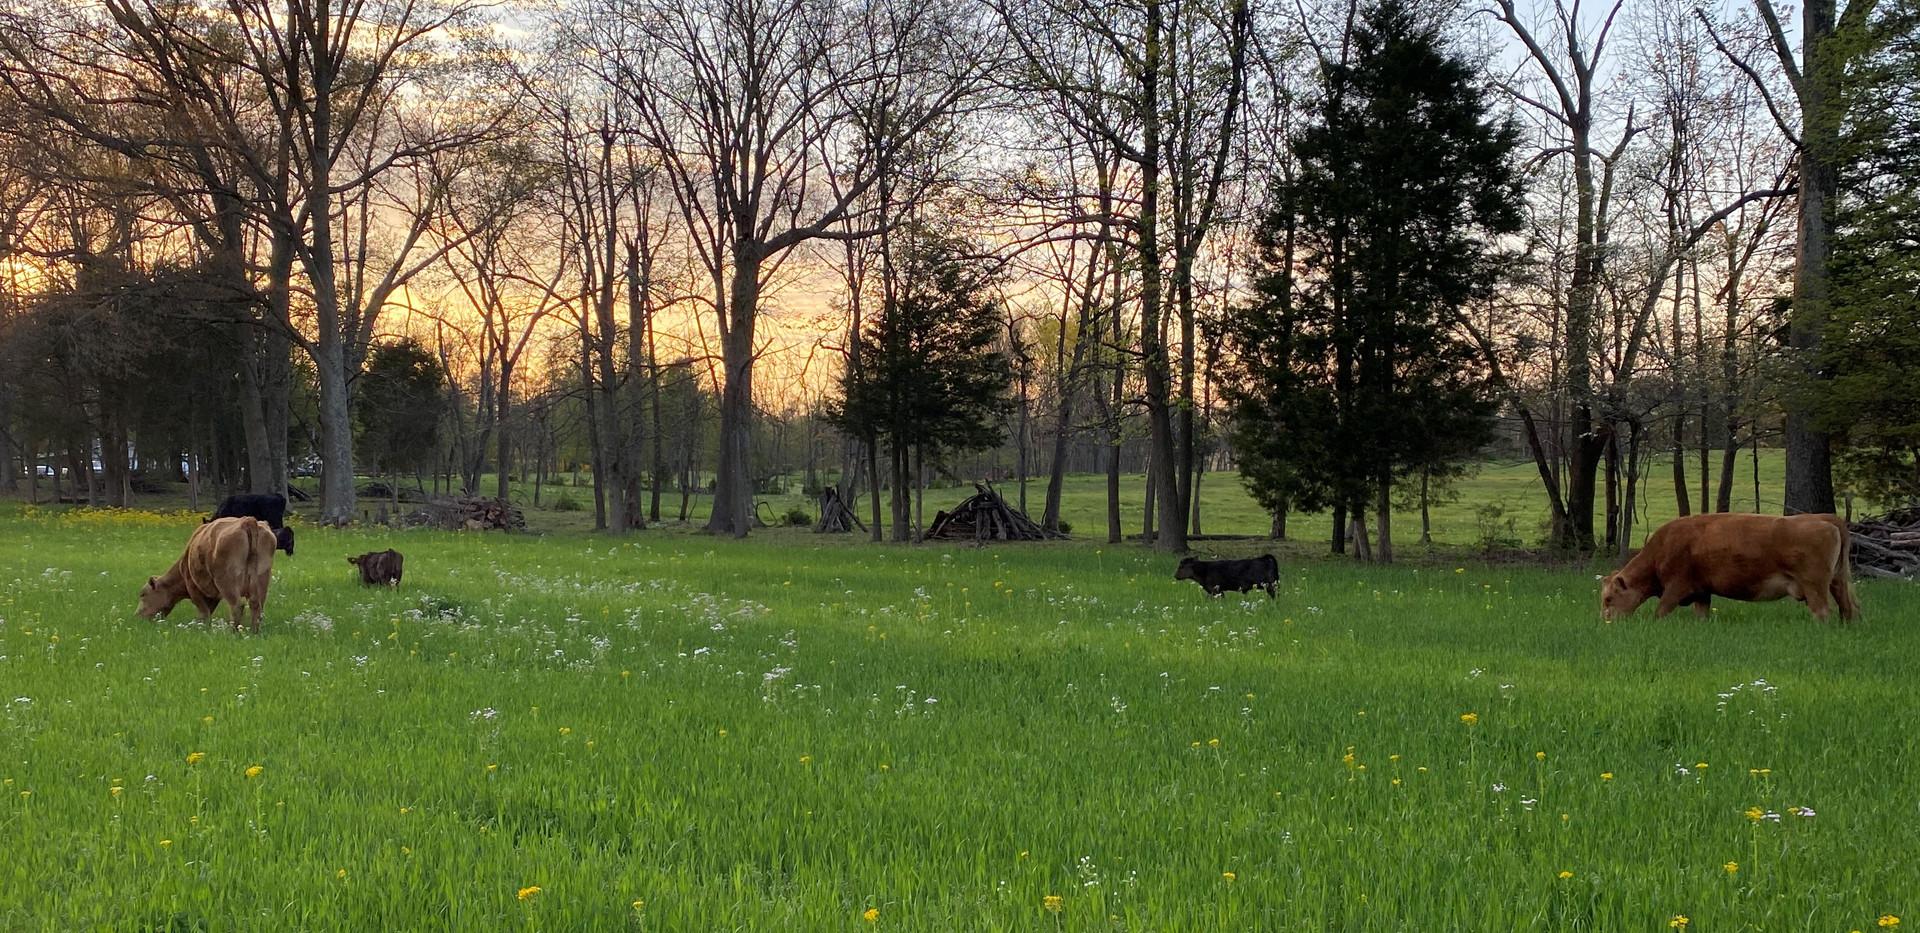 cattle grazing wheat April 2020.jpg